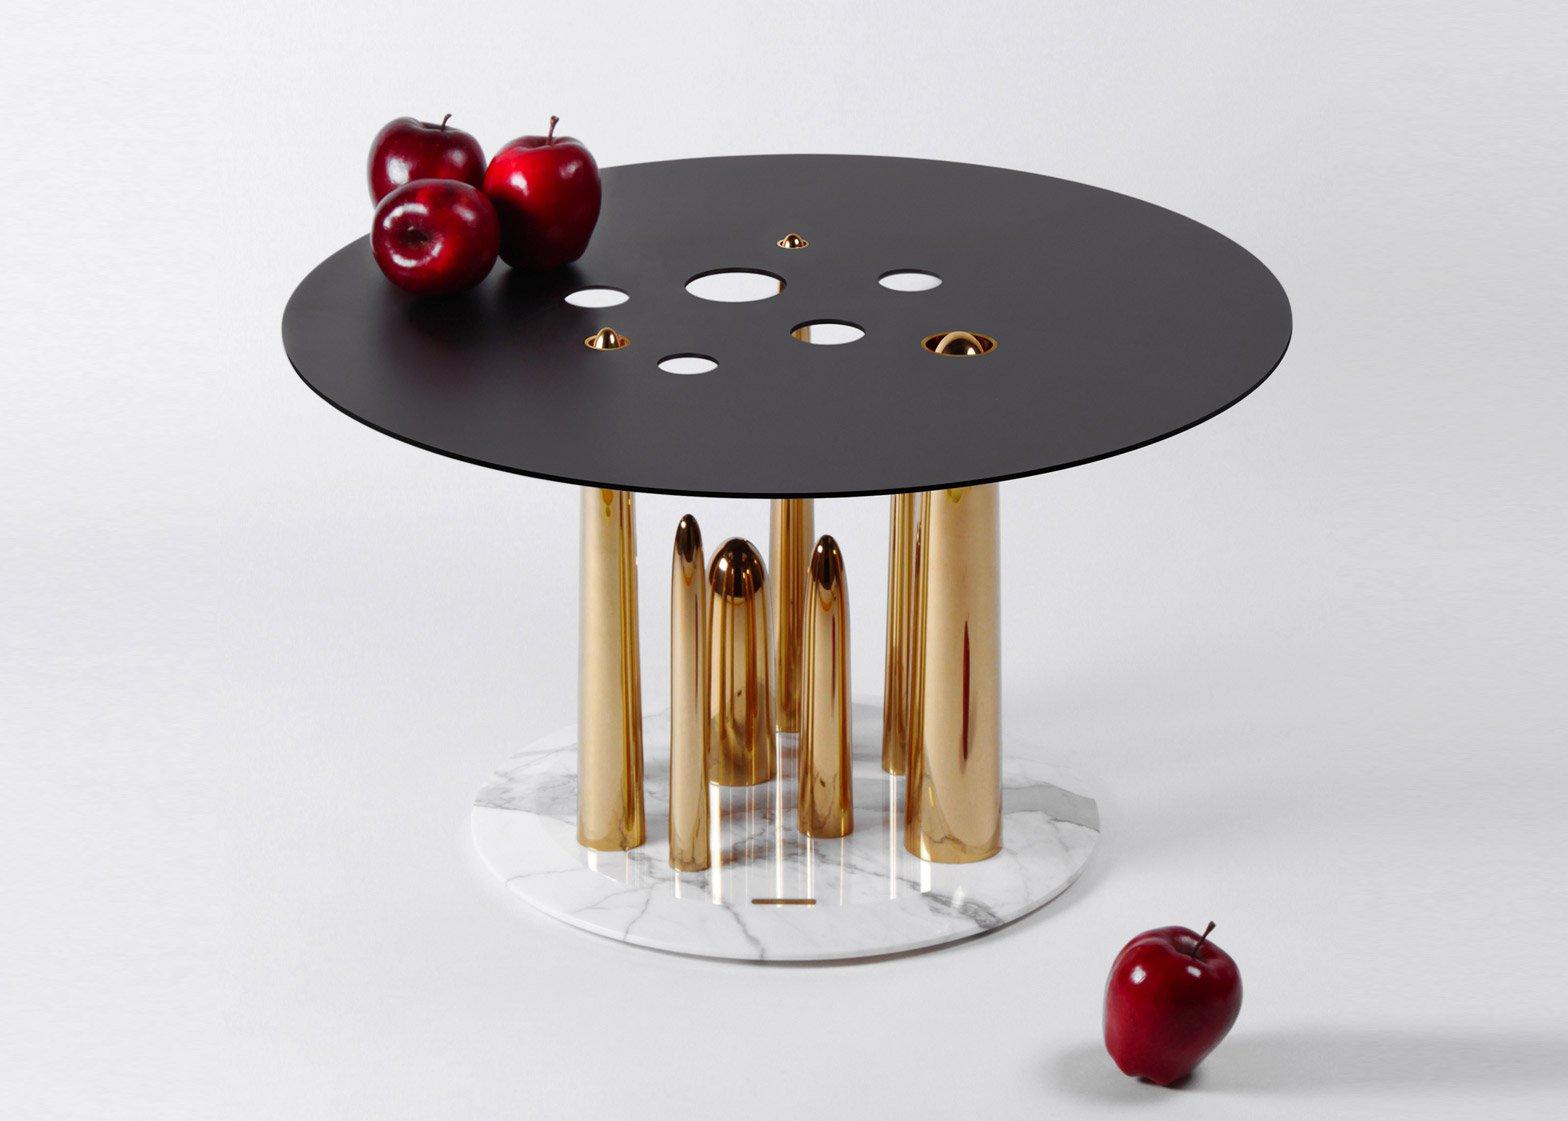 glory-holes_richard-yasmine_solifore-groupage_table_sex-toy_lebanese-product-design_dezeen_1568_5